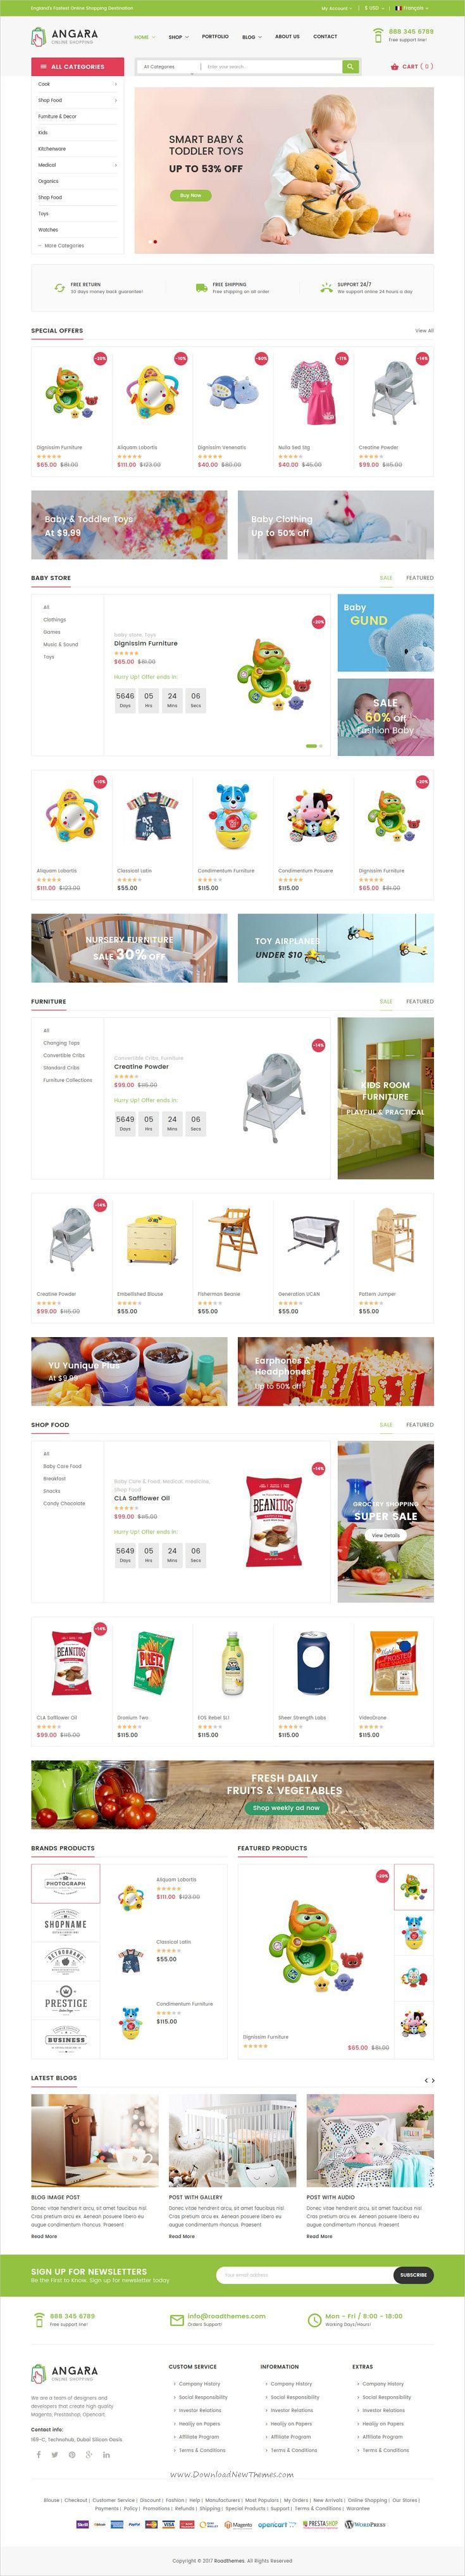 best kids template wordpress images on pinterest